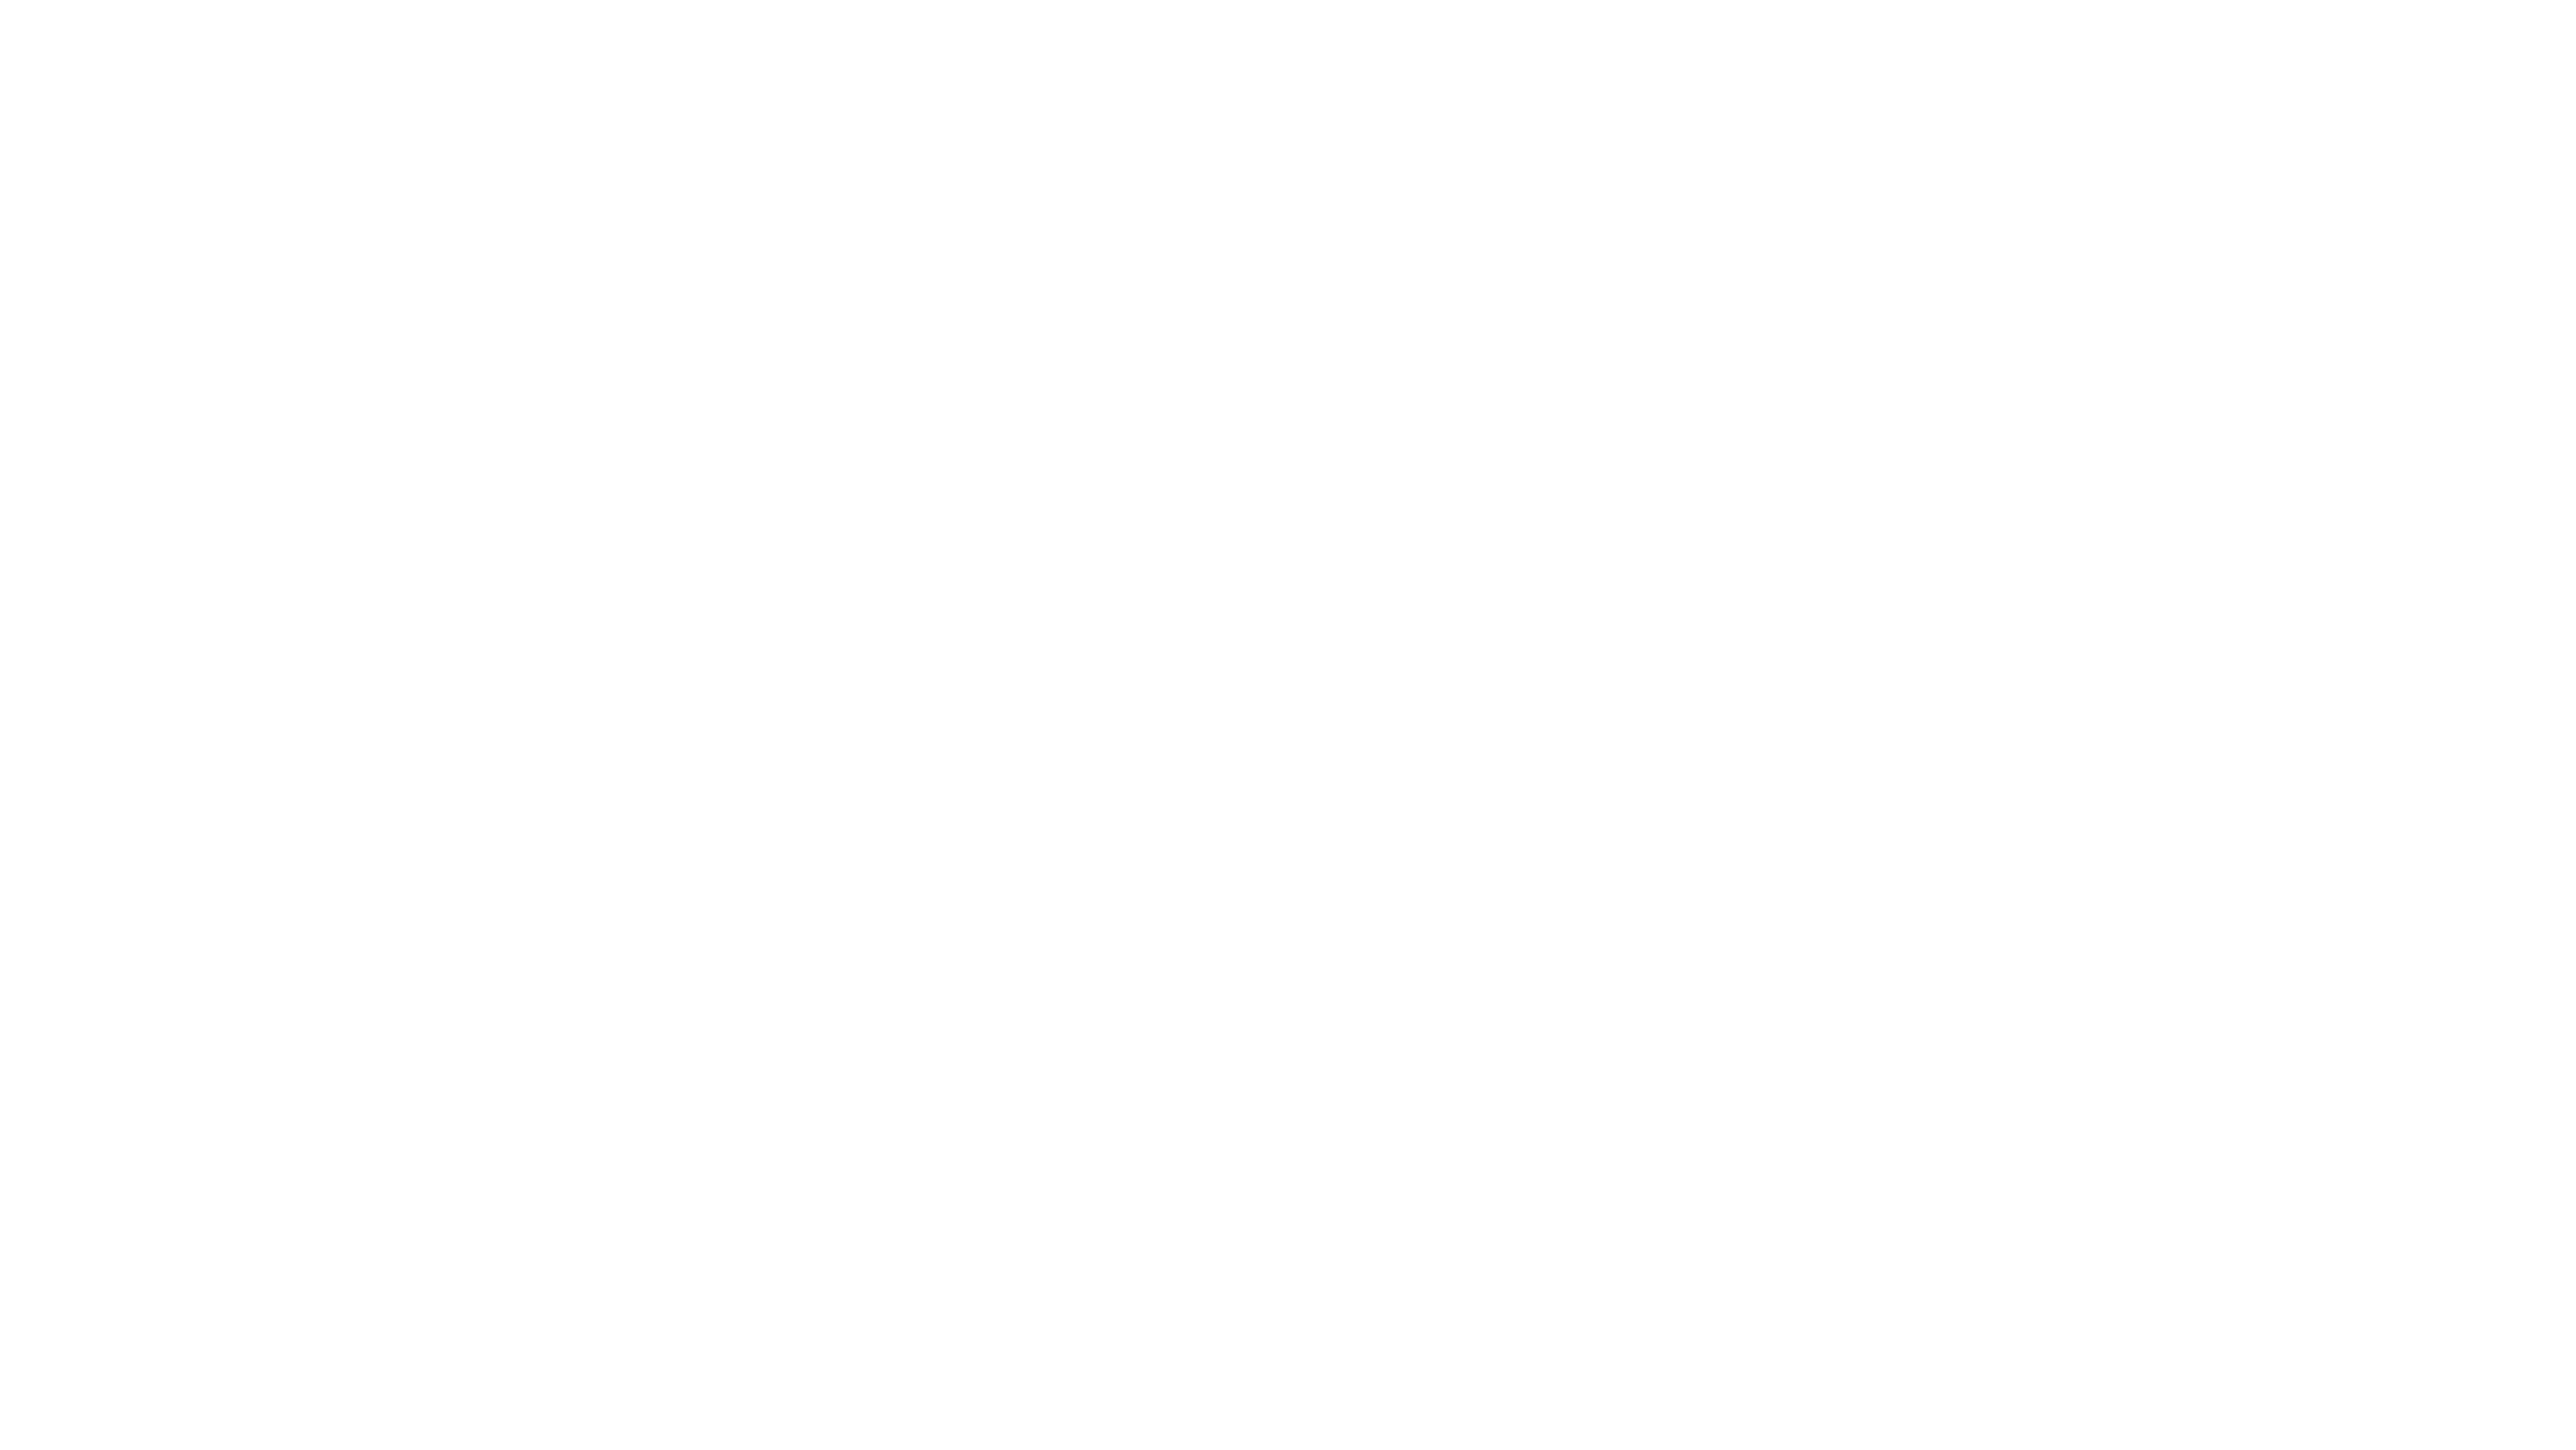 visualisieren1